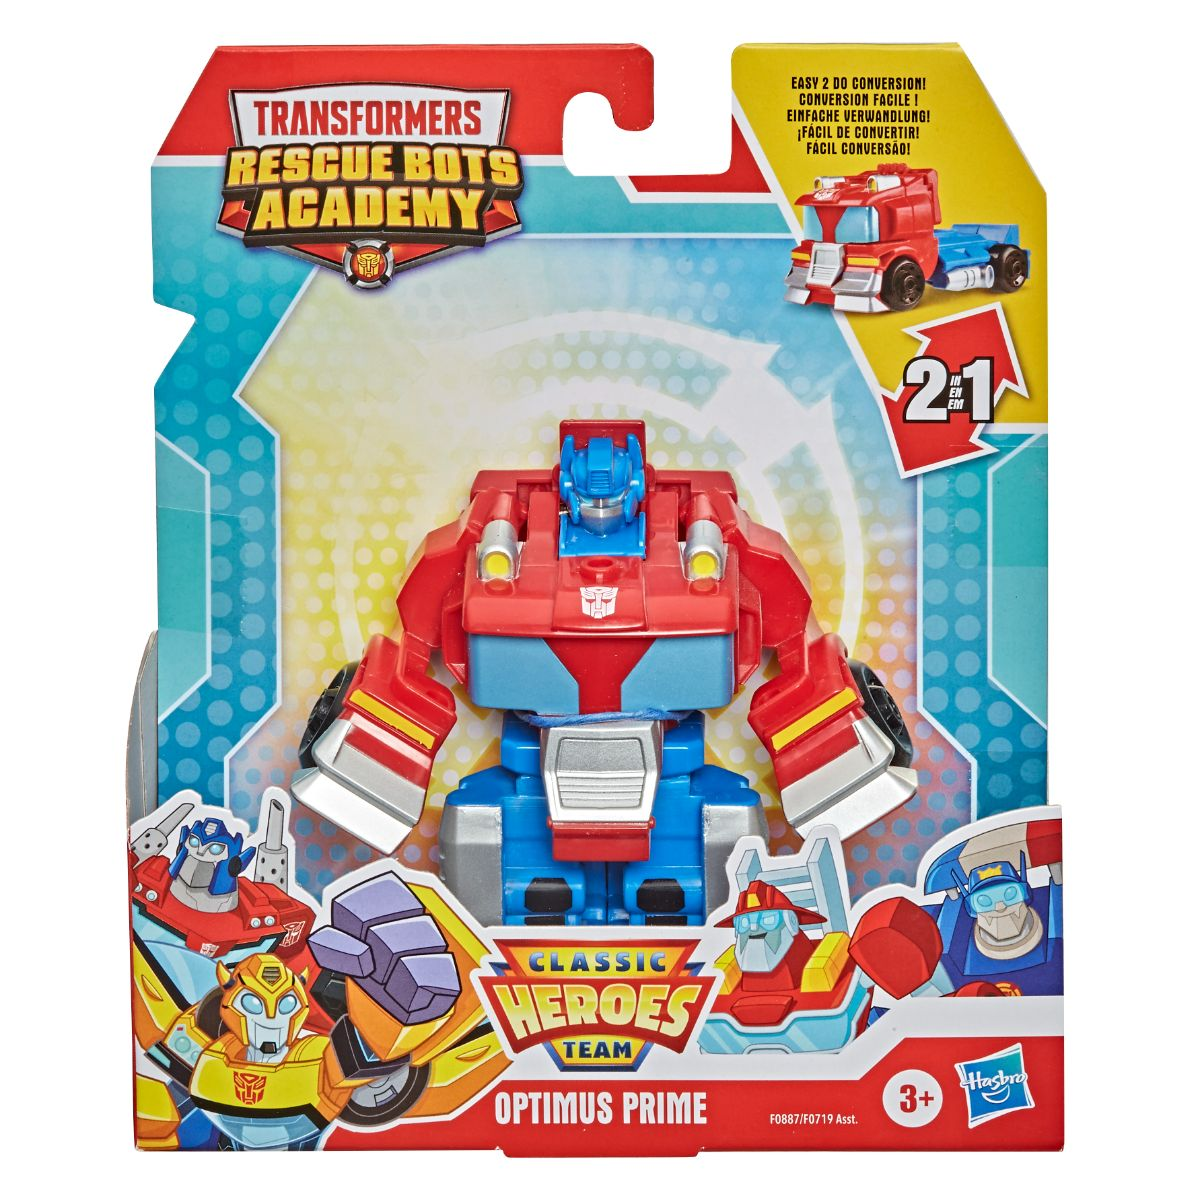 Figurina Transformers, Rescue Bots Academy, Optimus Prime, F08875